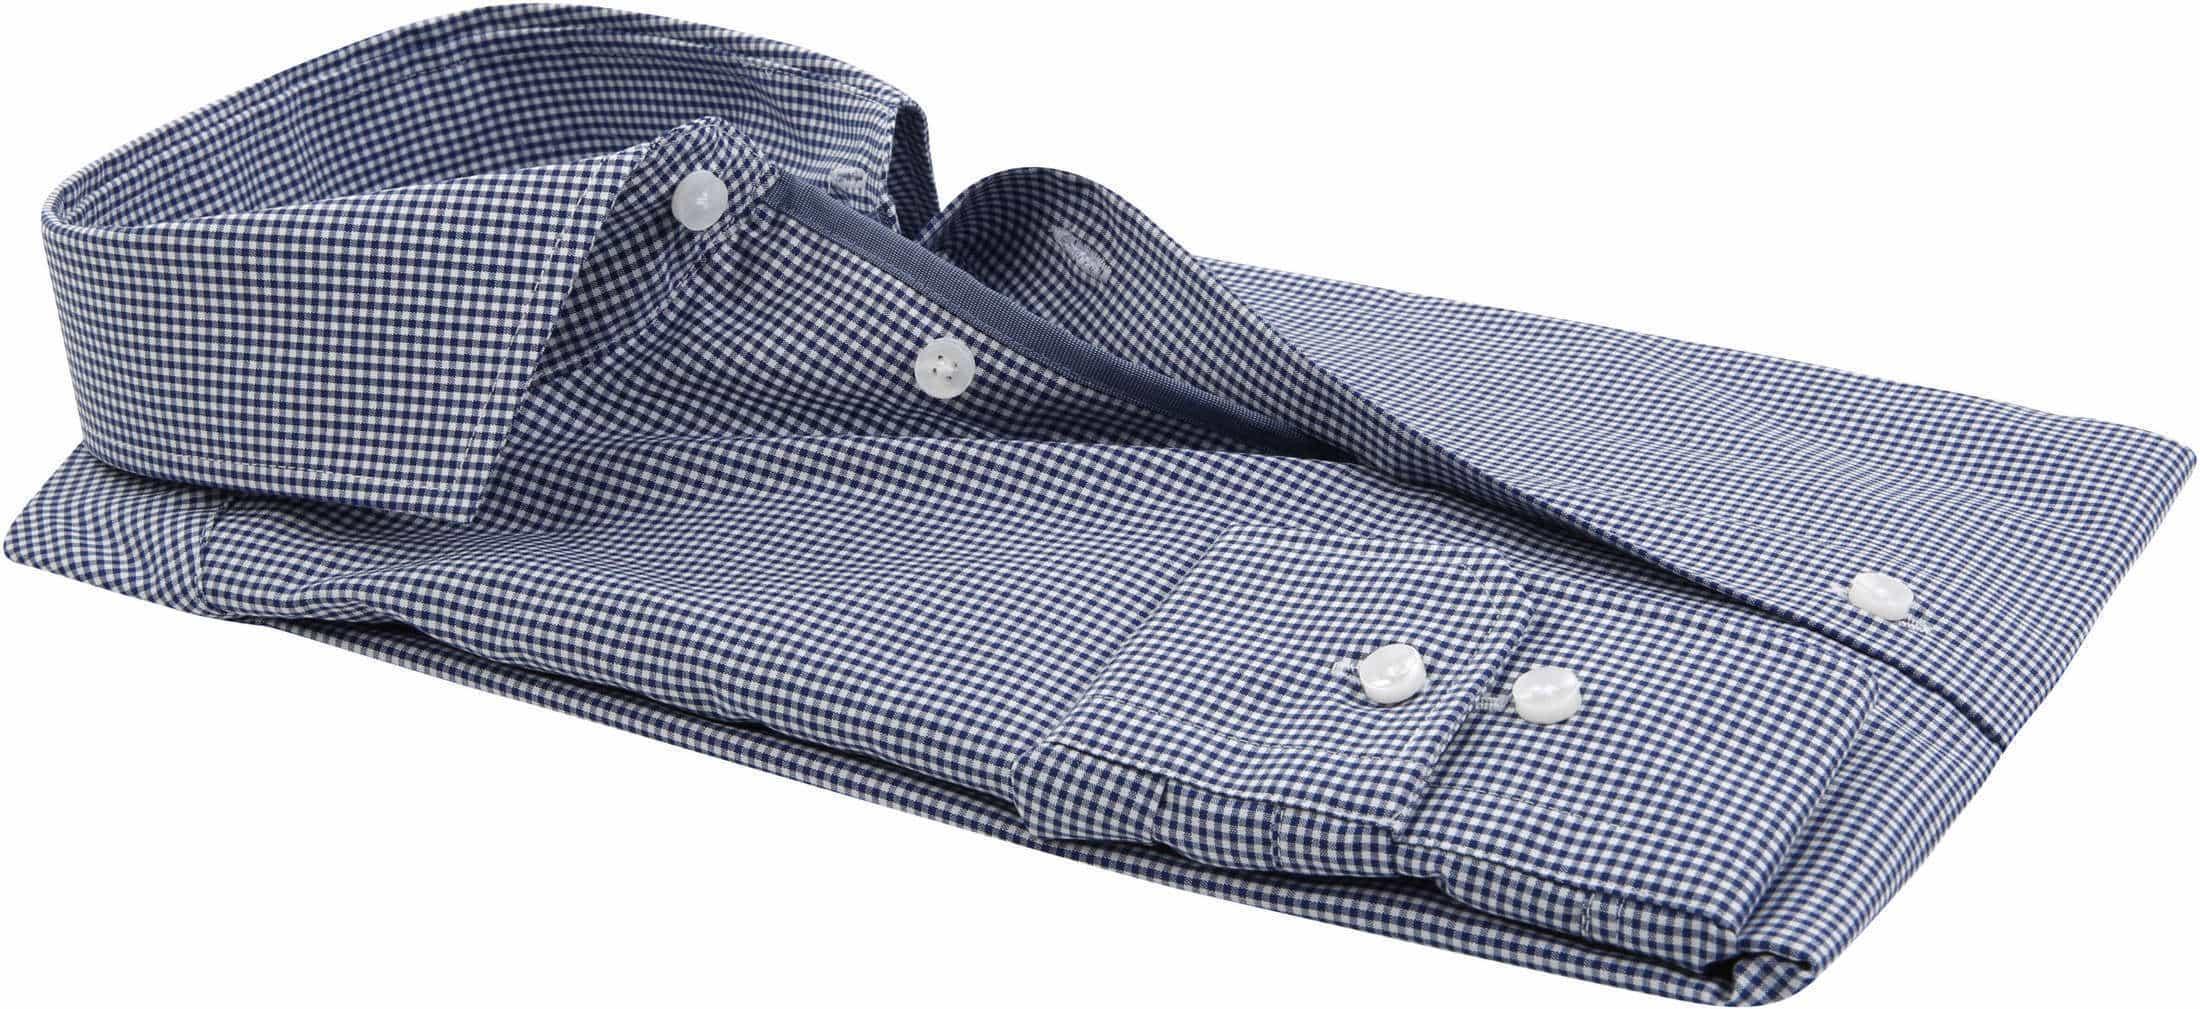 Seidensticker Overhemd TF Navy Ruit foto 3